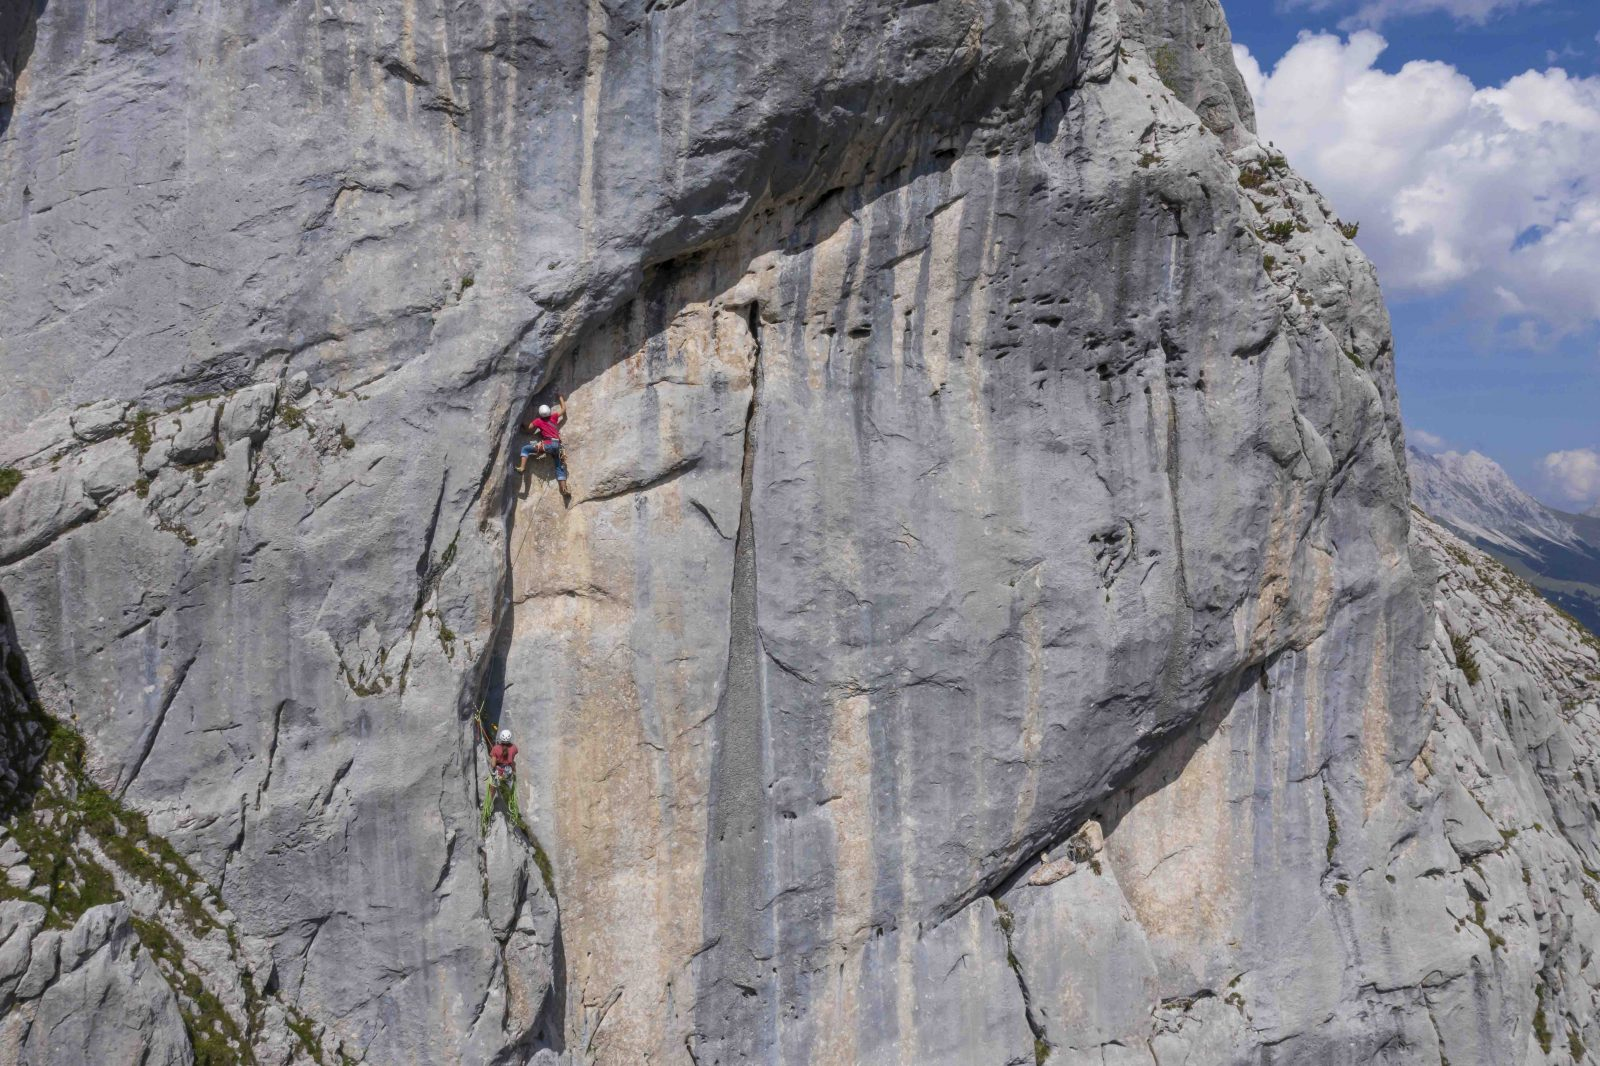 Klettern Tiroler Zugspitz Arenda @ Michael Meisl I Climbers Paradise